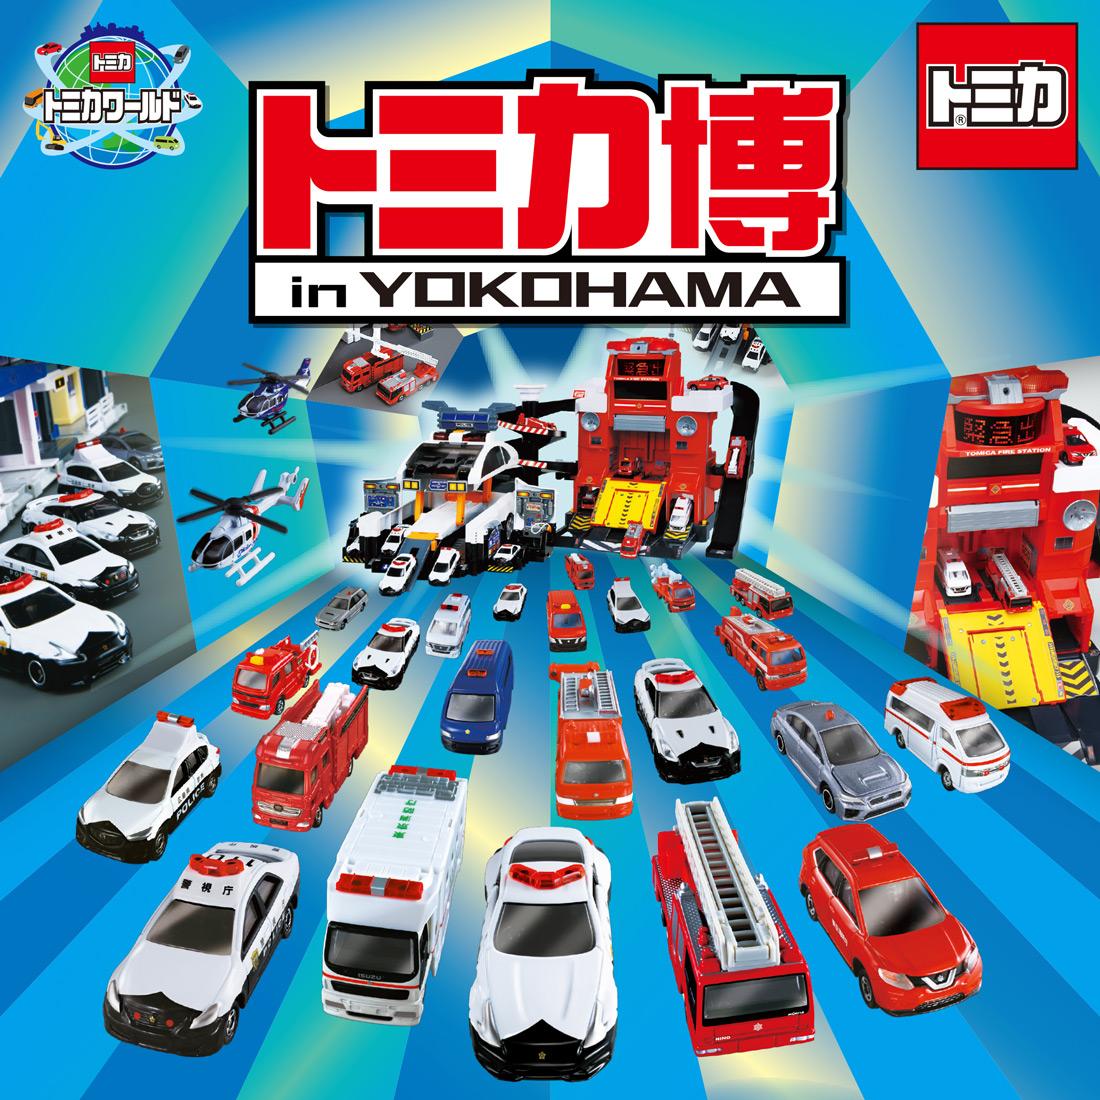 Tomica Expo in YOKOHAMA 2019